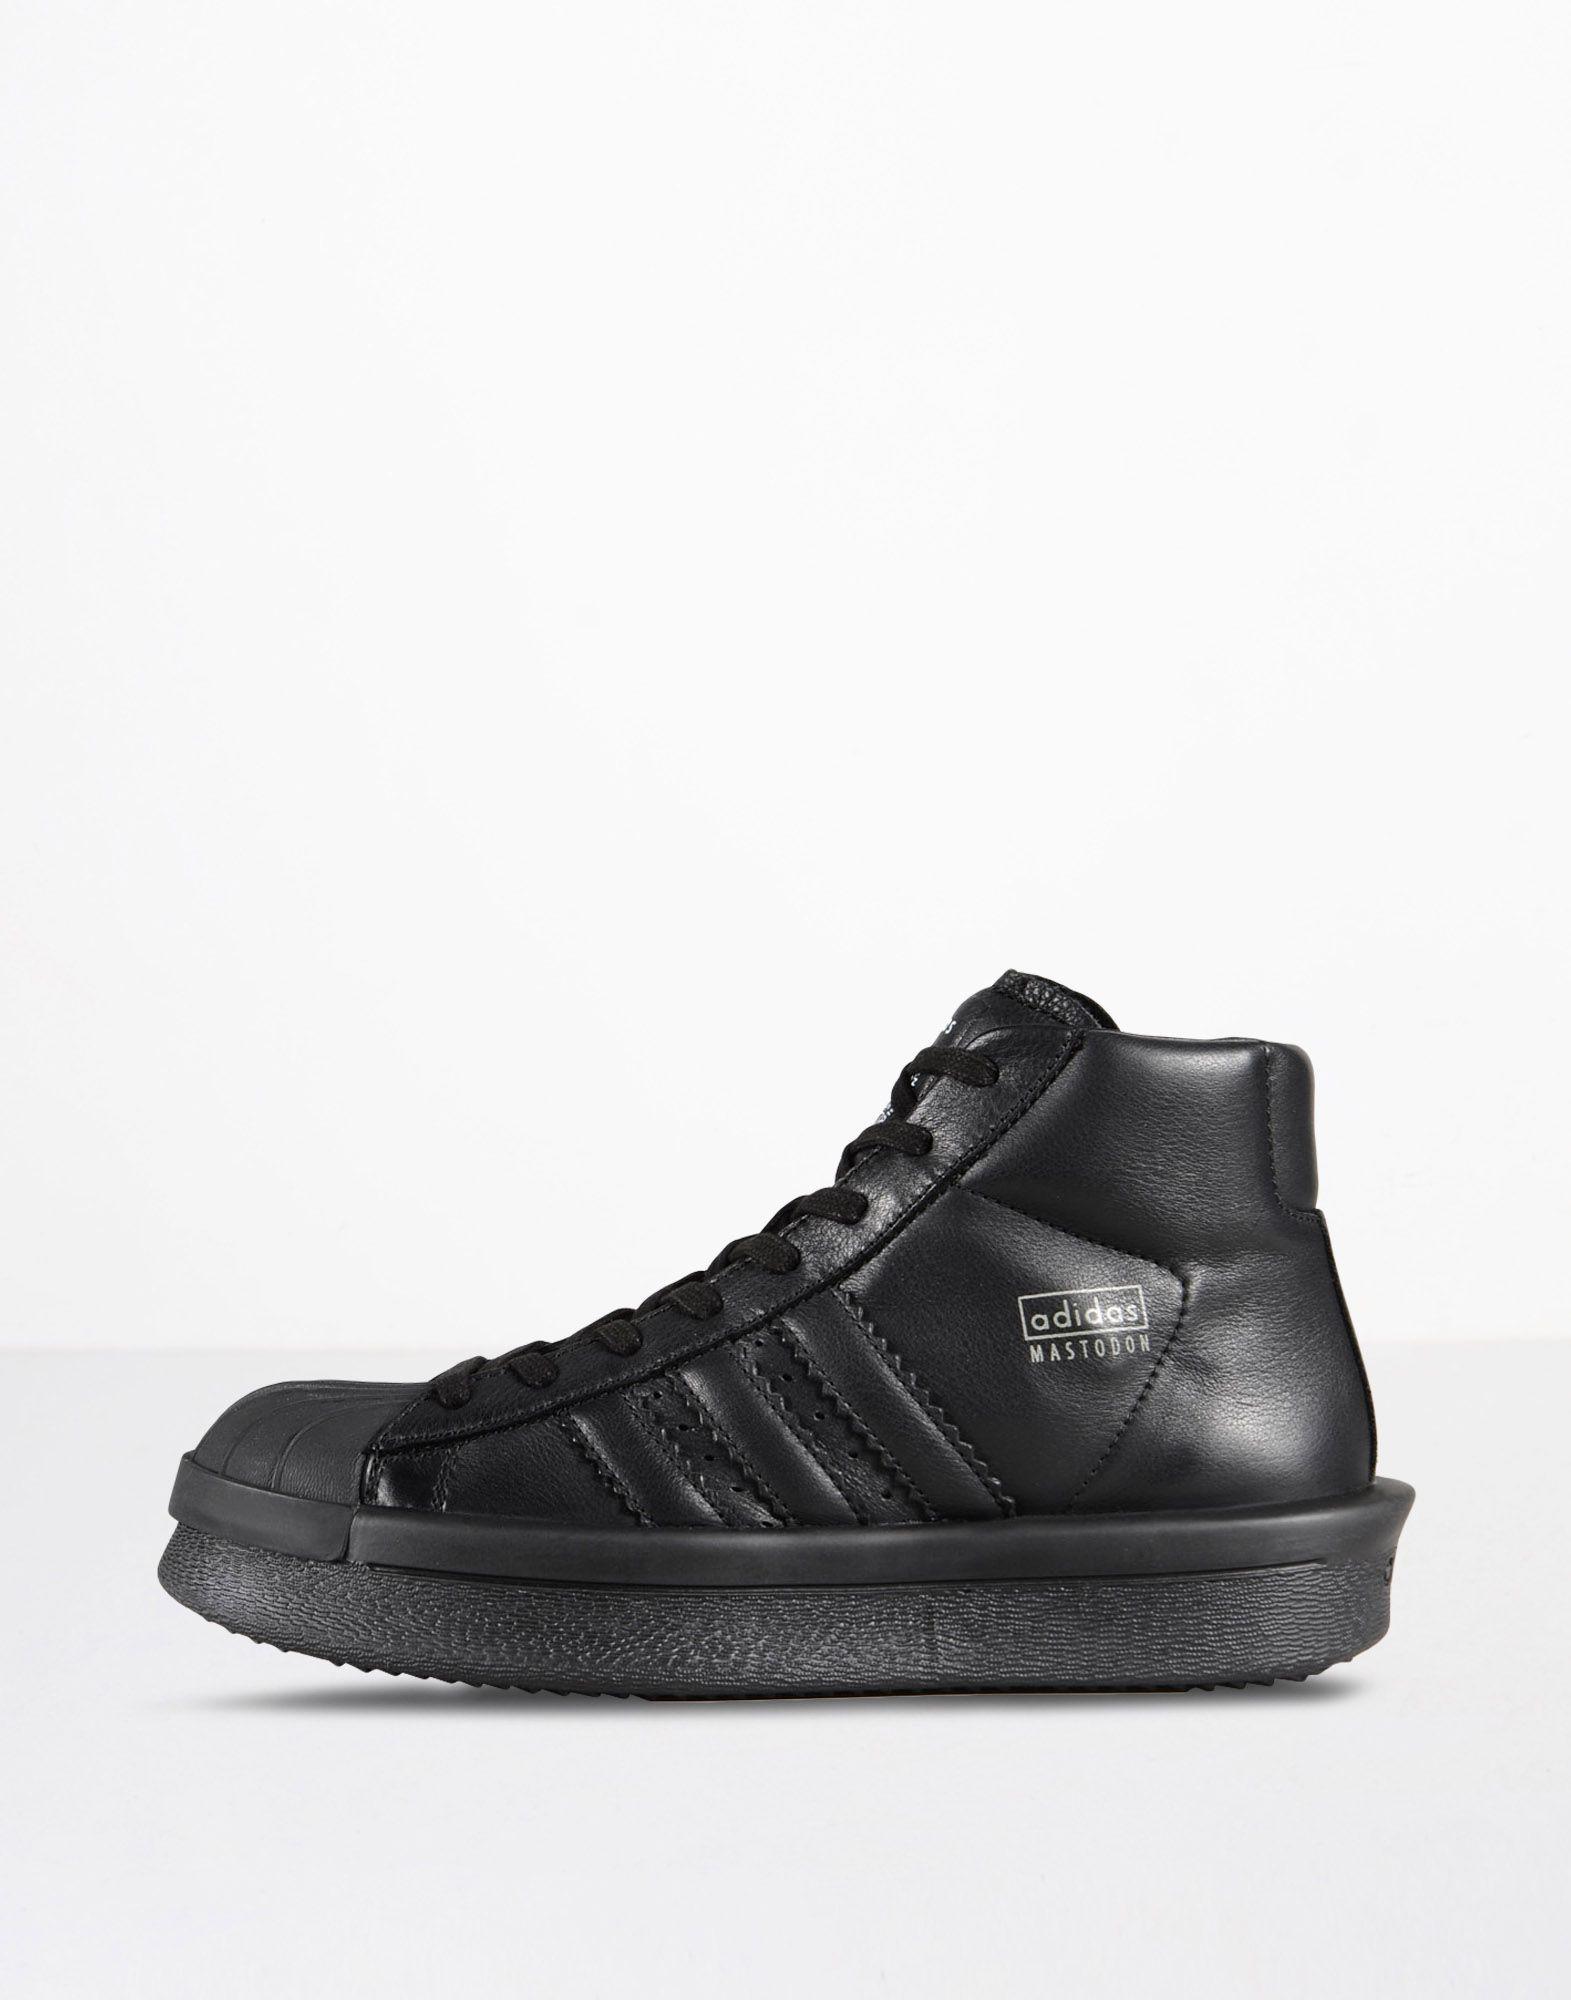 RO unisex MASTODON PRO MODEL Zapatos unisex RO Y 3 adidas | Fins and Scales and 90ee62